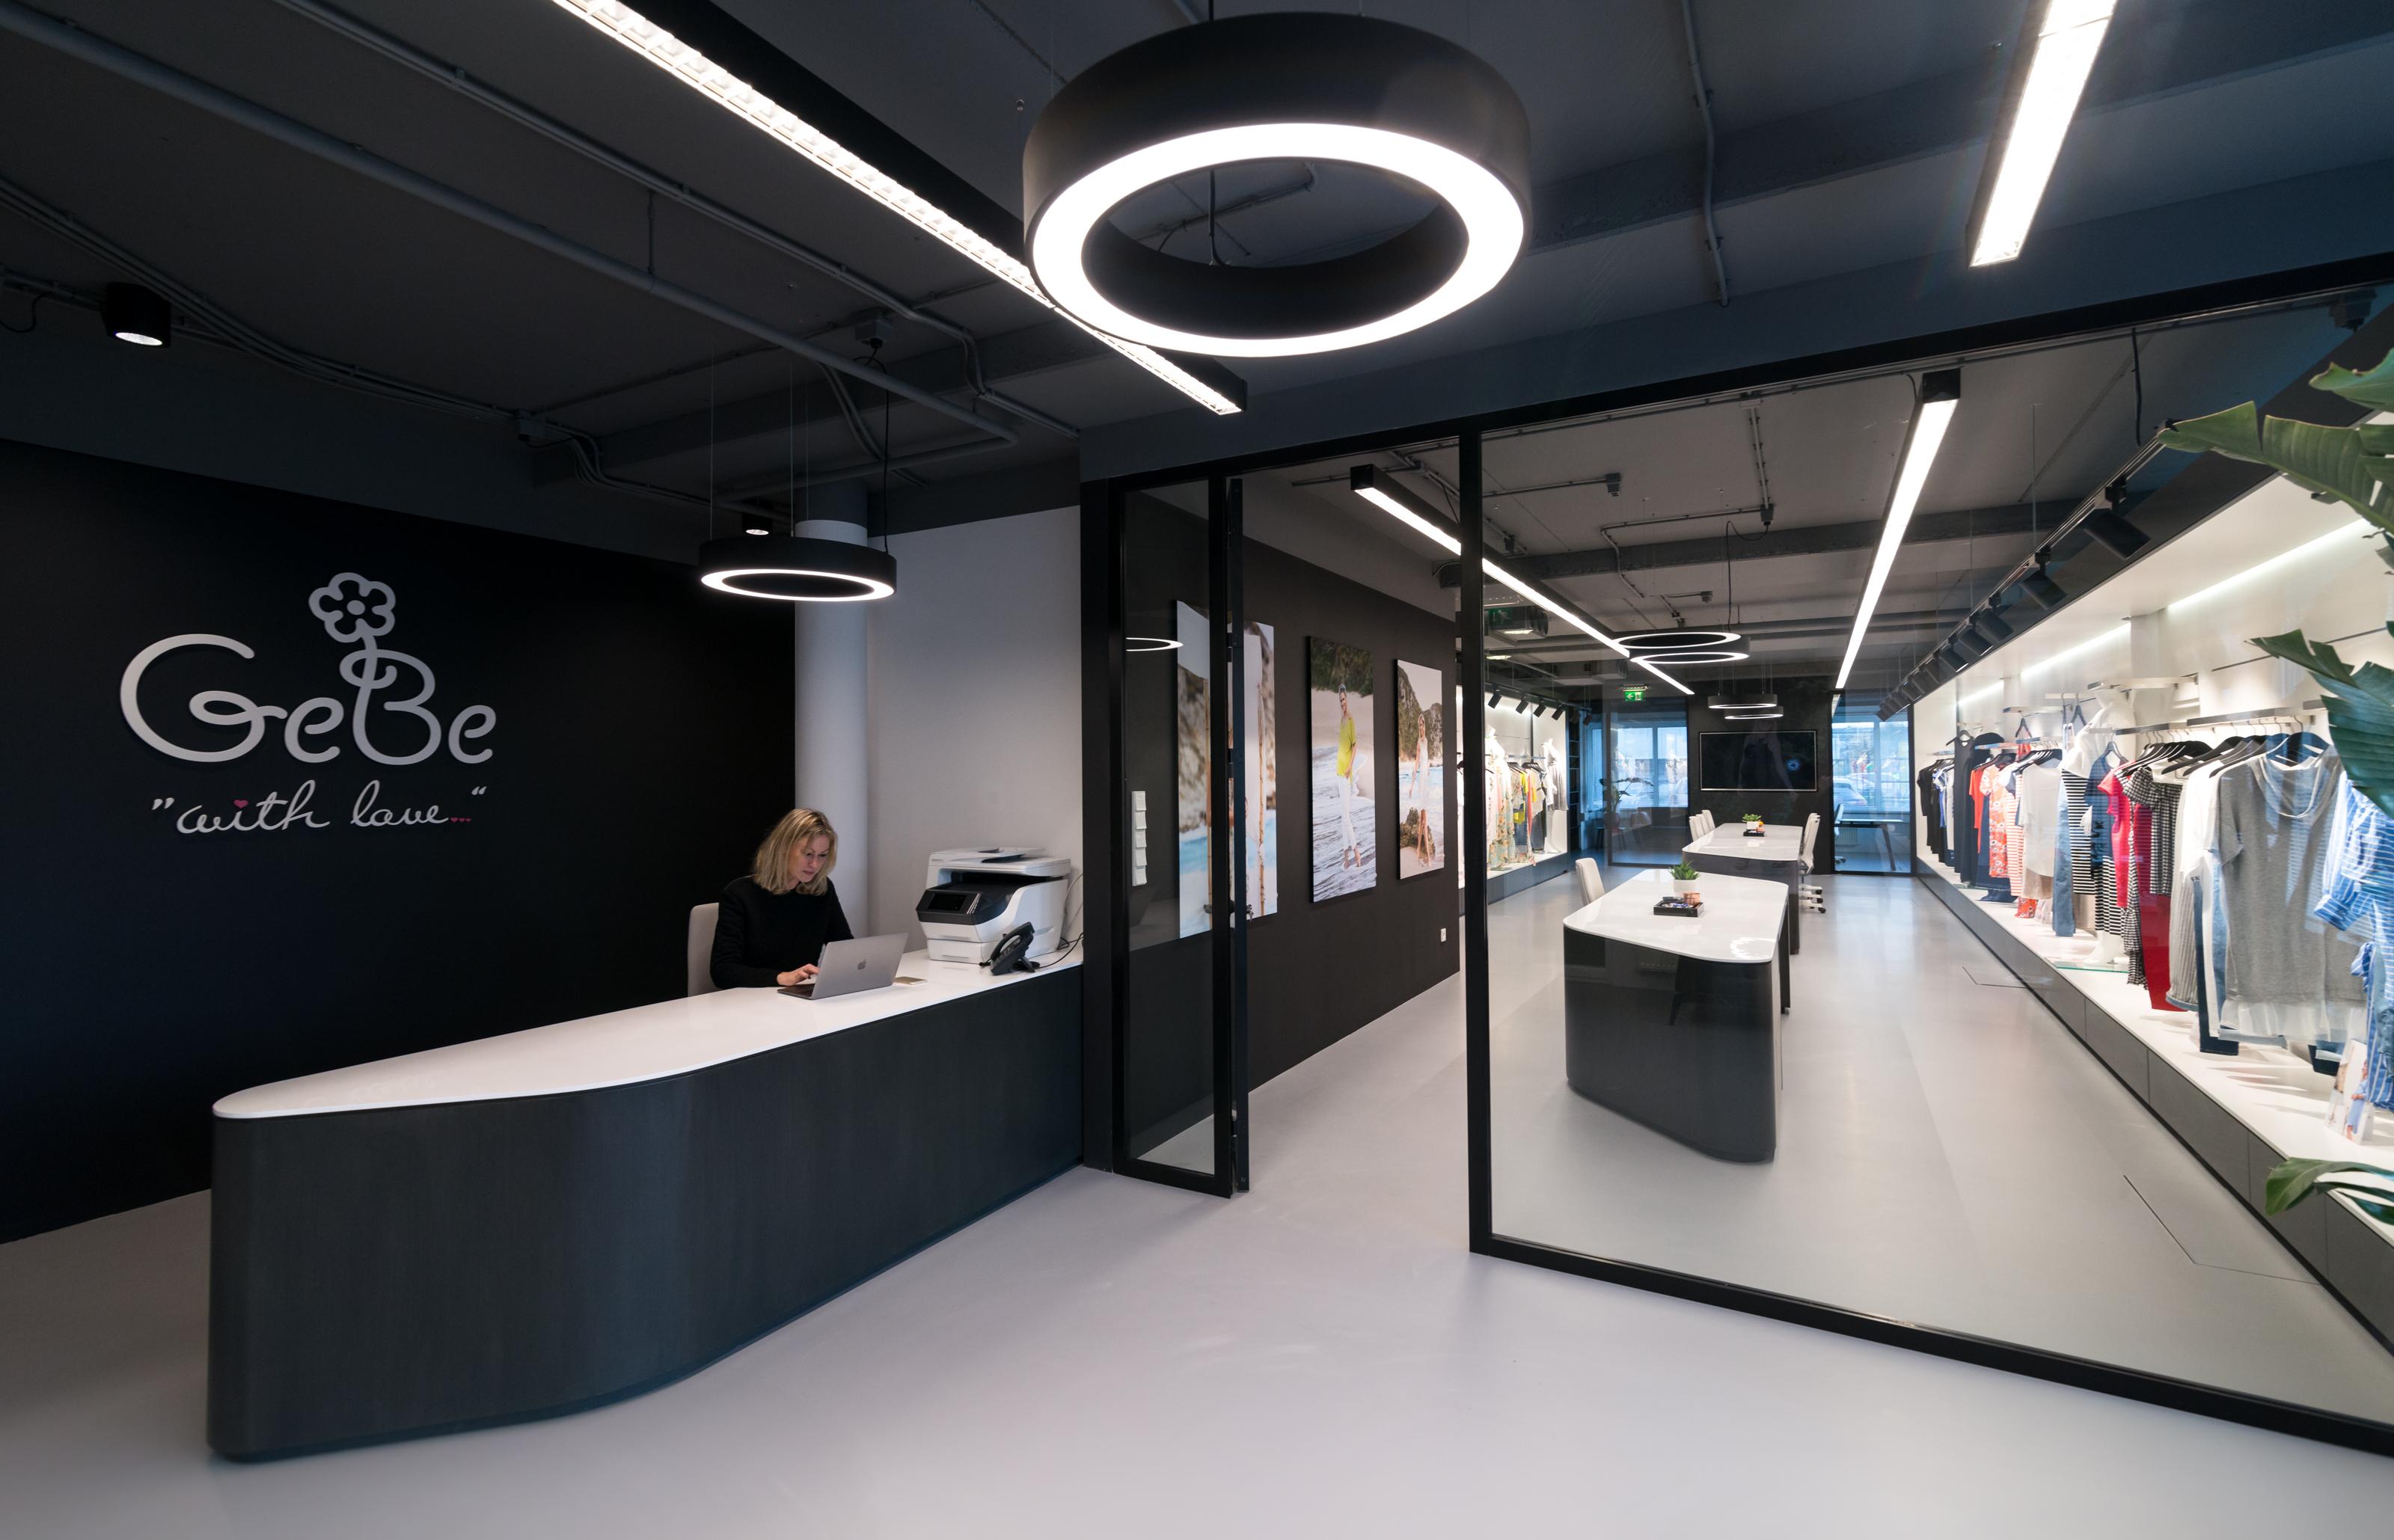 Interior Headquarter GeBe